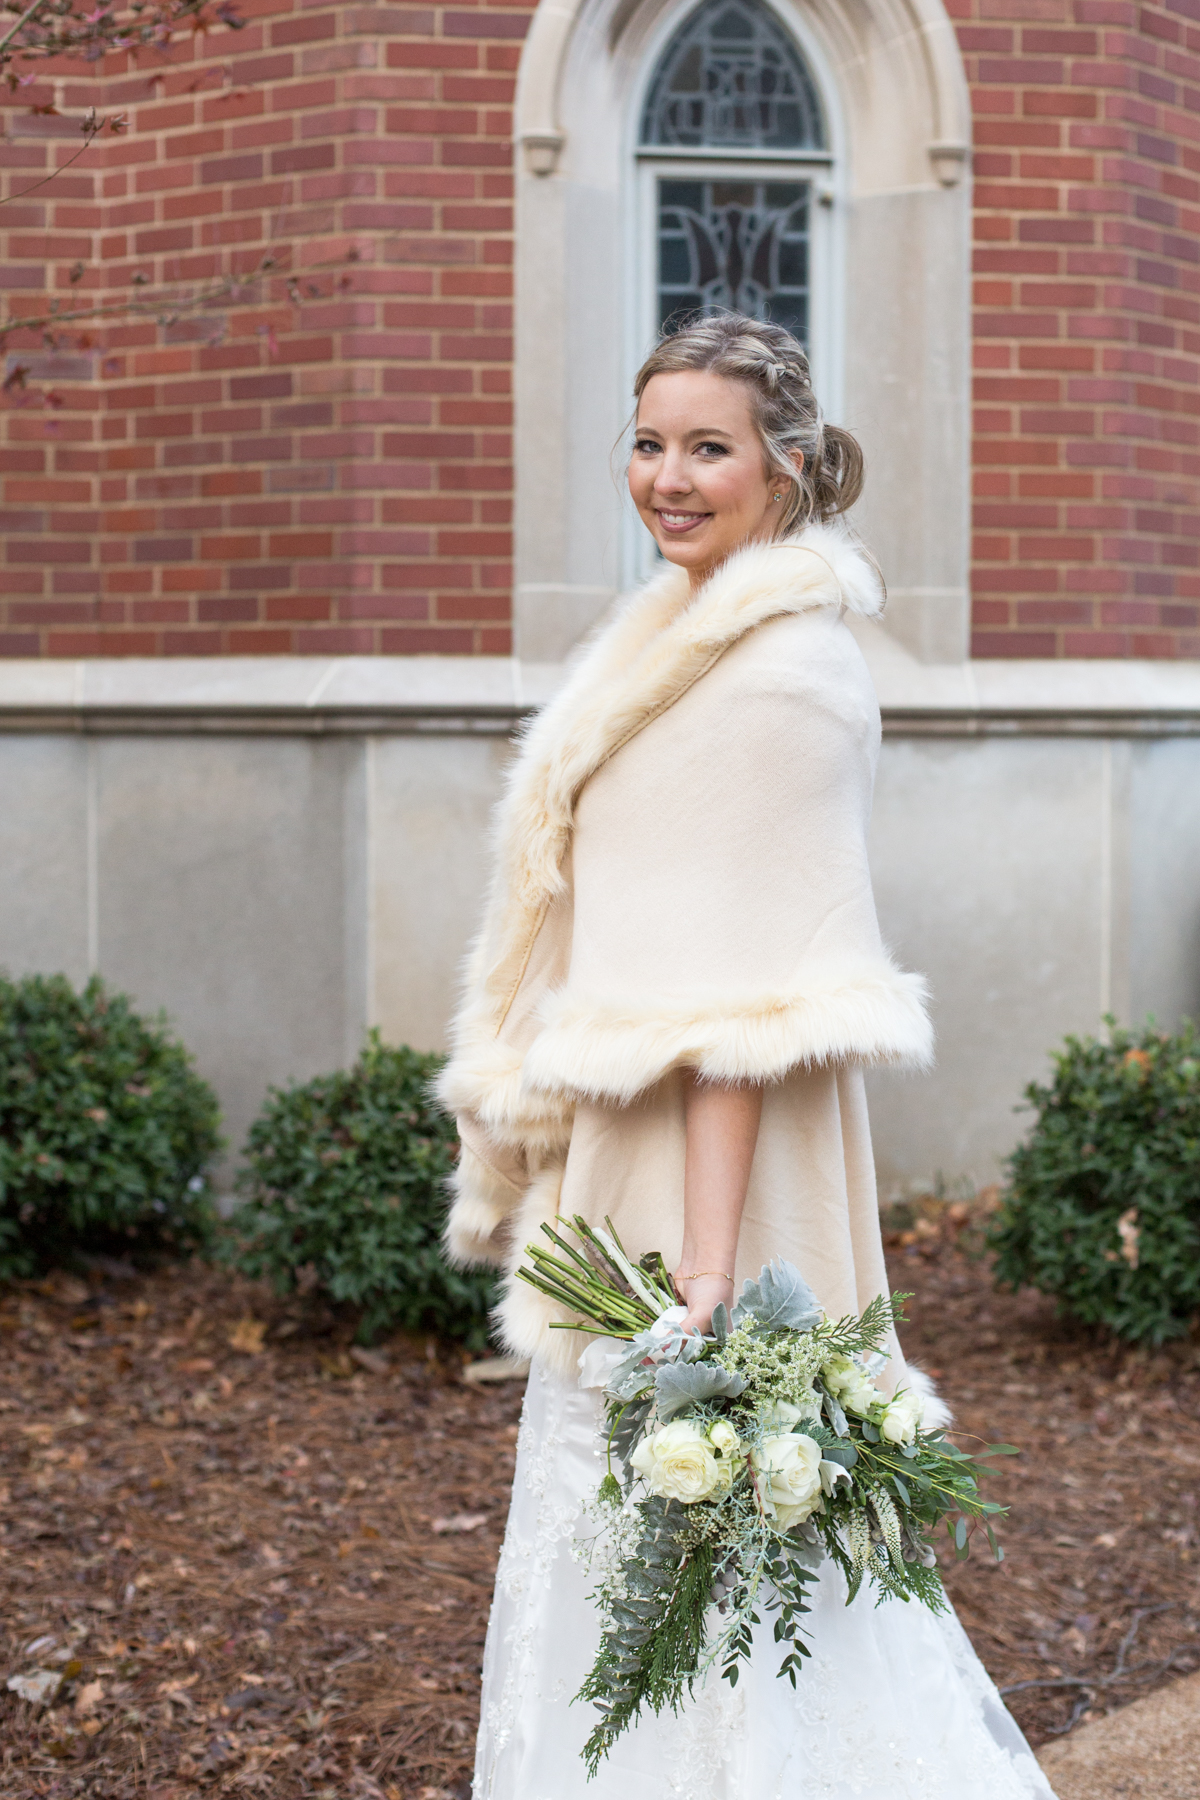 Kelli-and-Matt-Nashville-Wedding-Sneak-Peak-0182.jpg